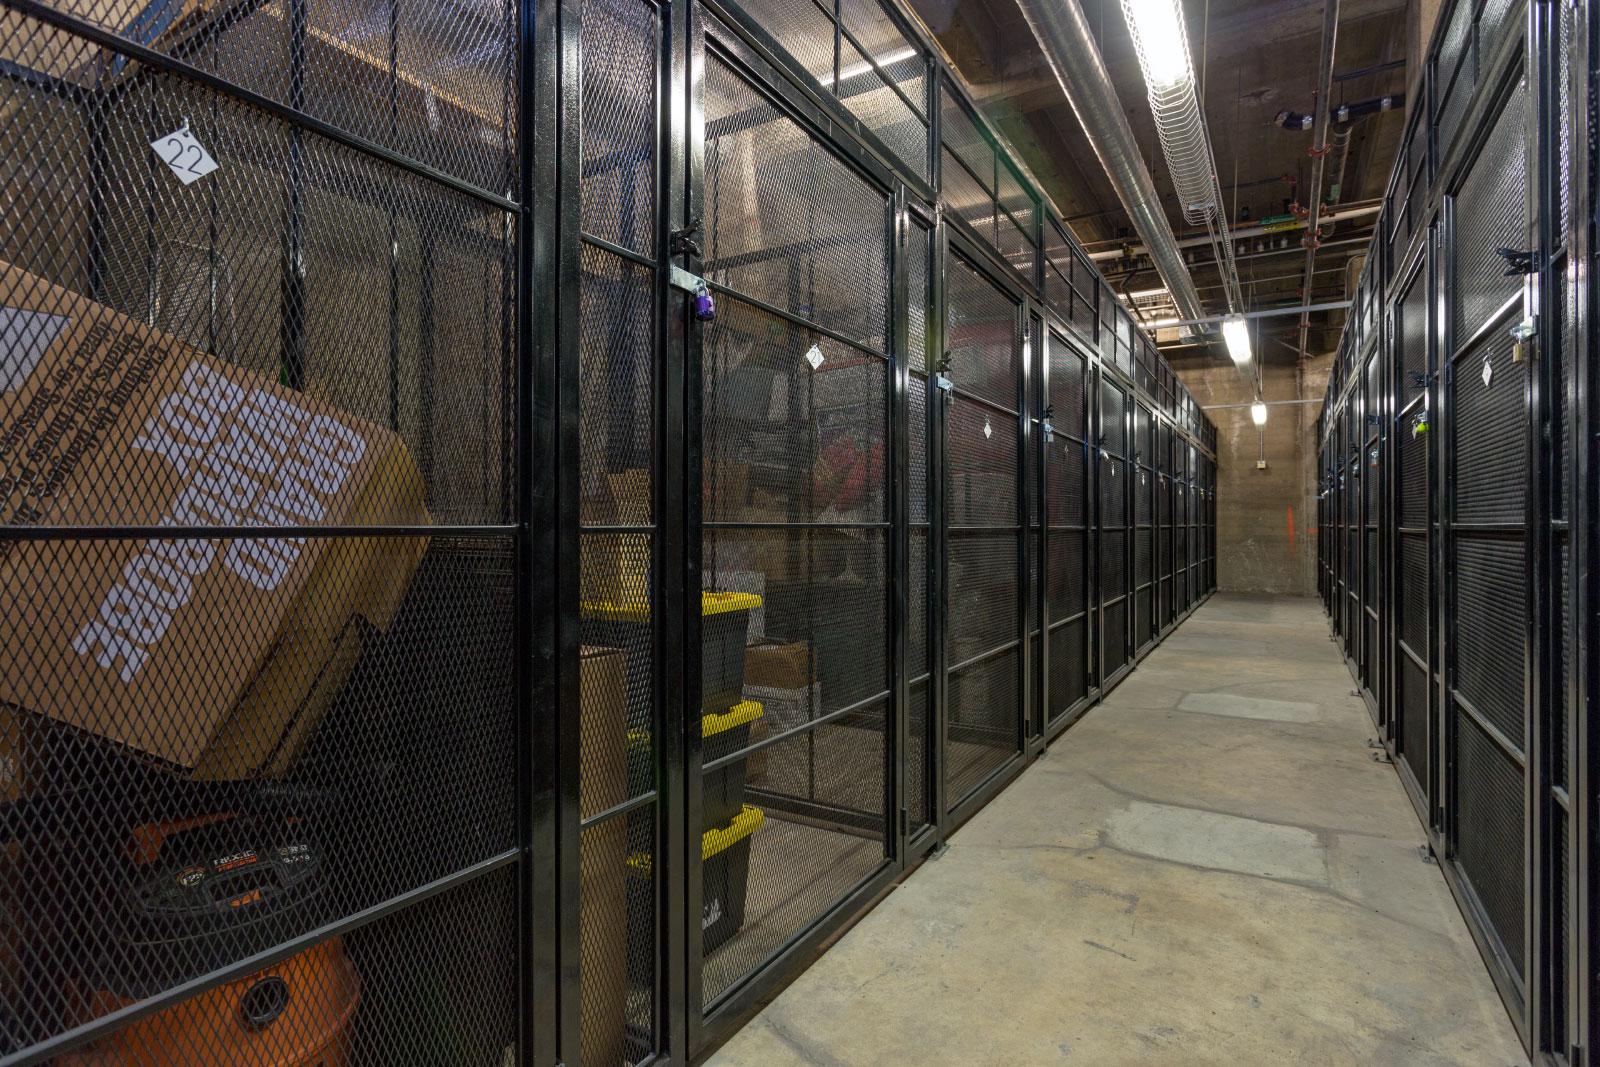 storage-locker_12844273933_o.jpg